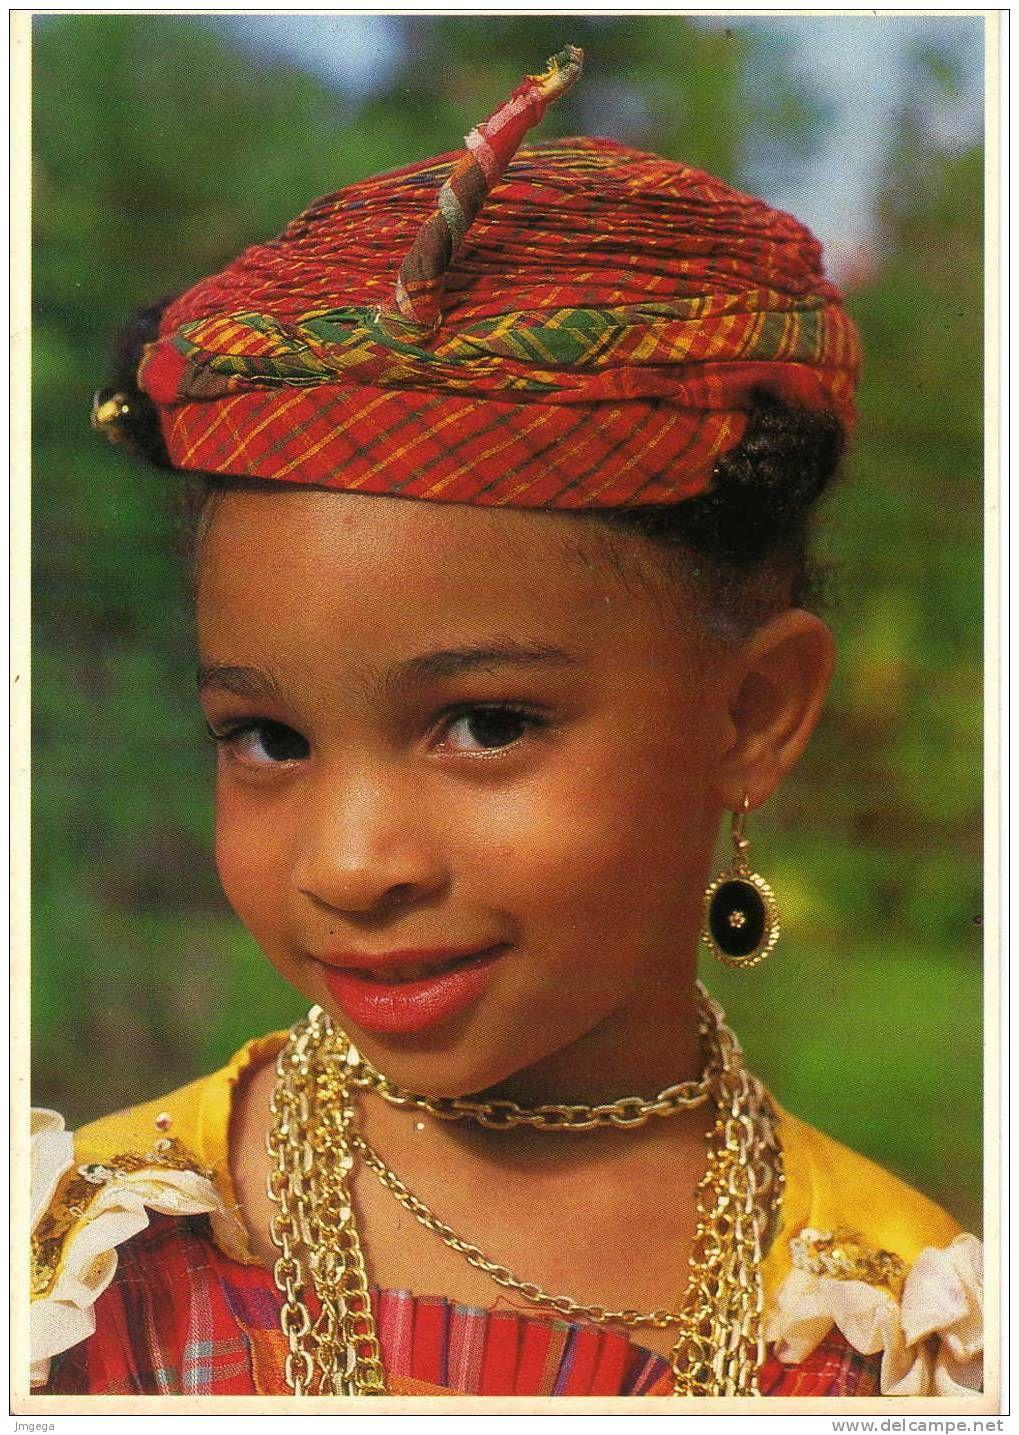 Petite fille en costume traditionnel Martinique